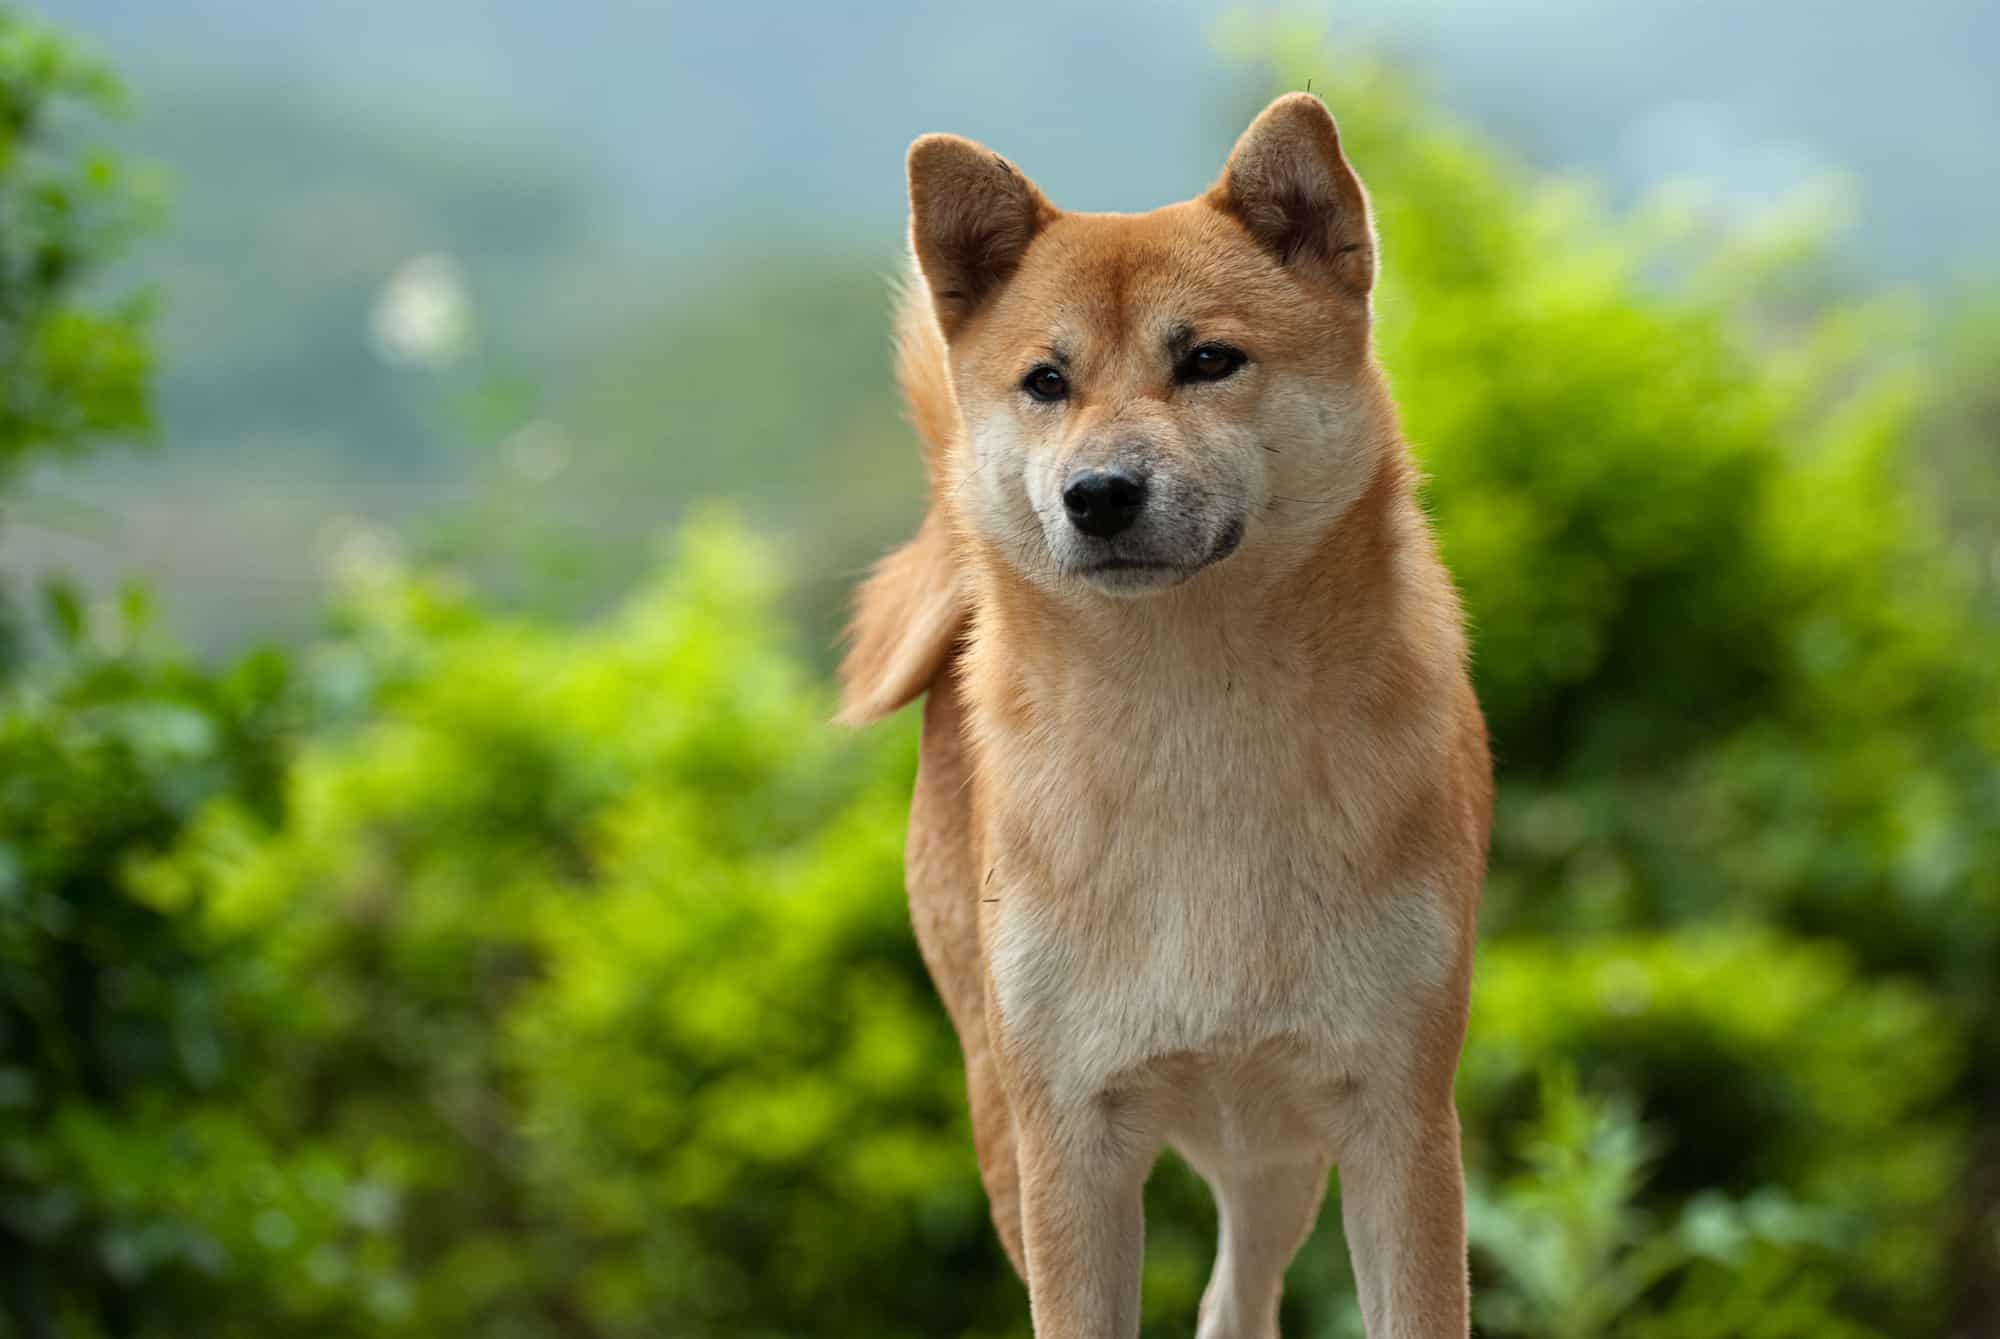 Dog foods for Shiba Inus